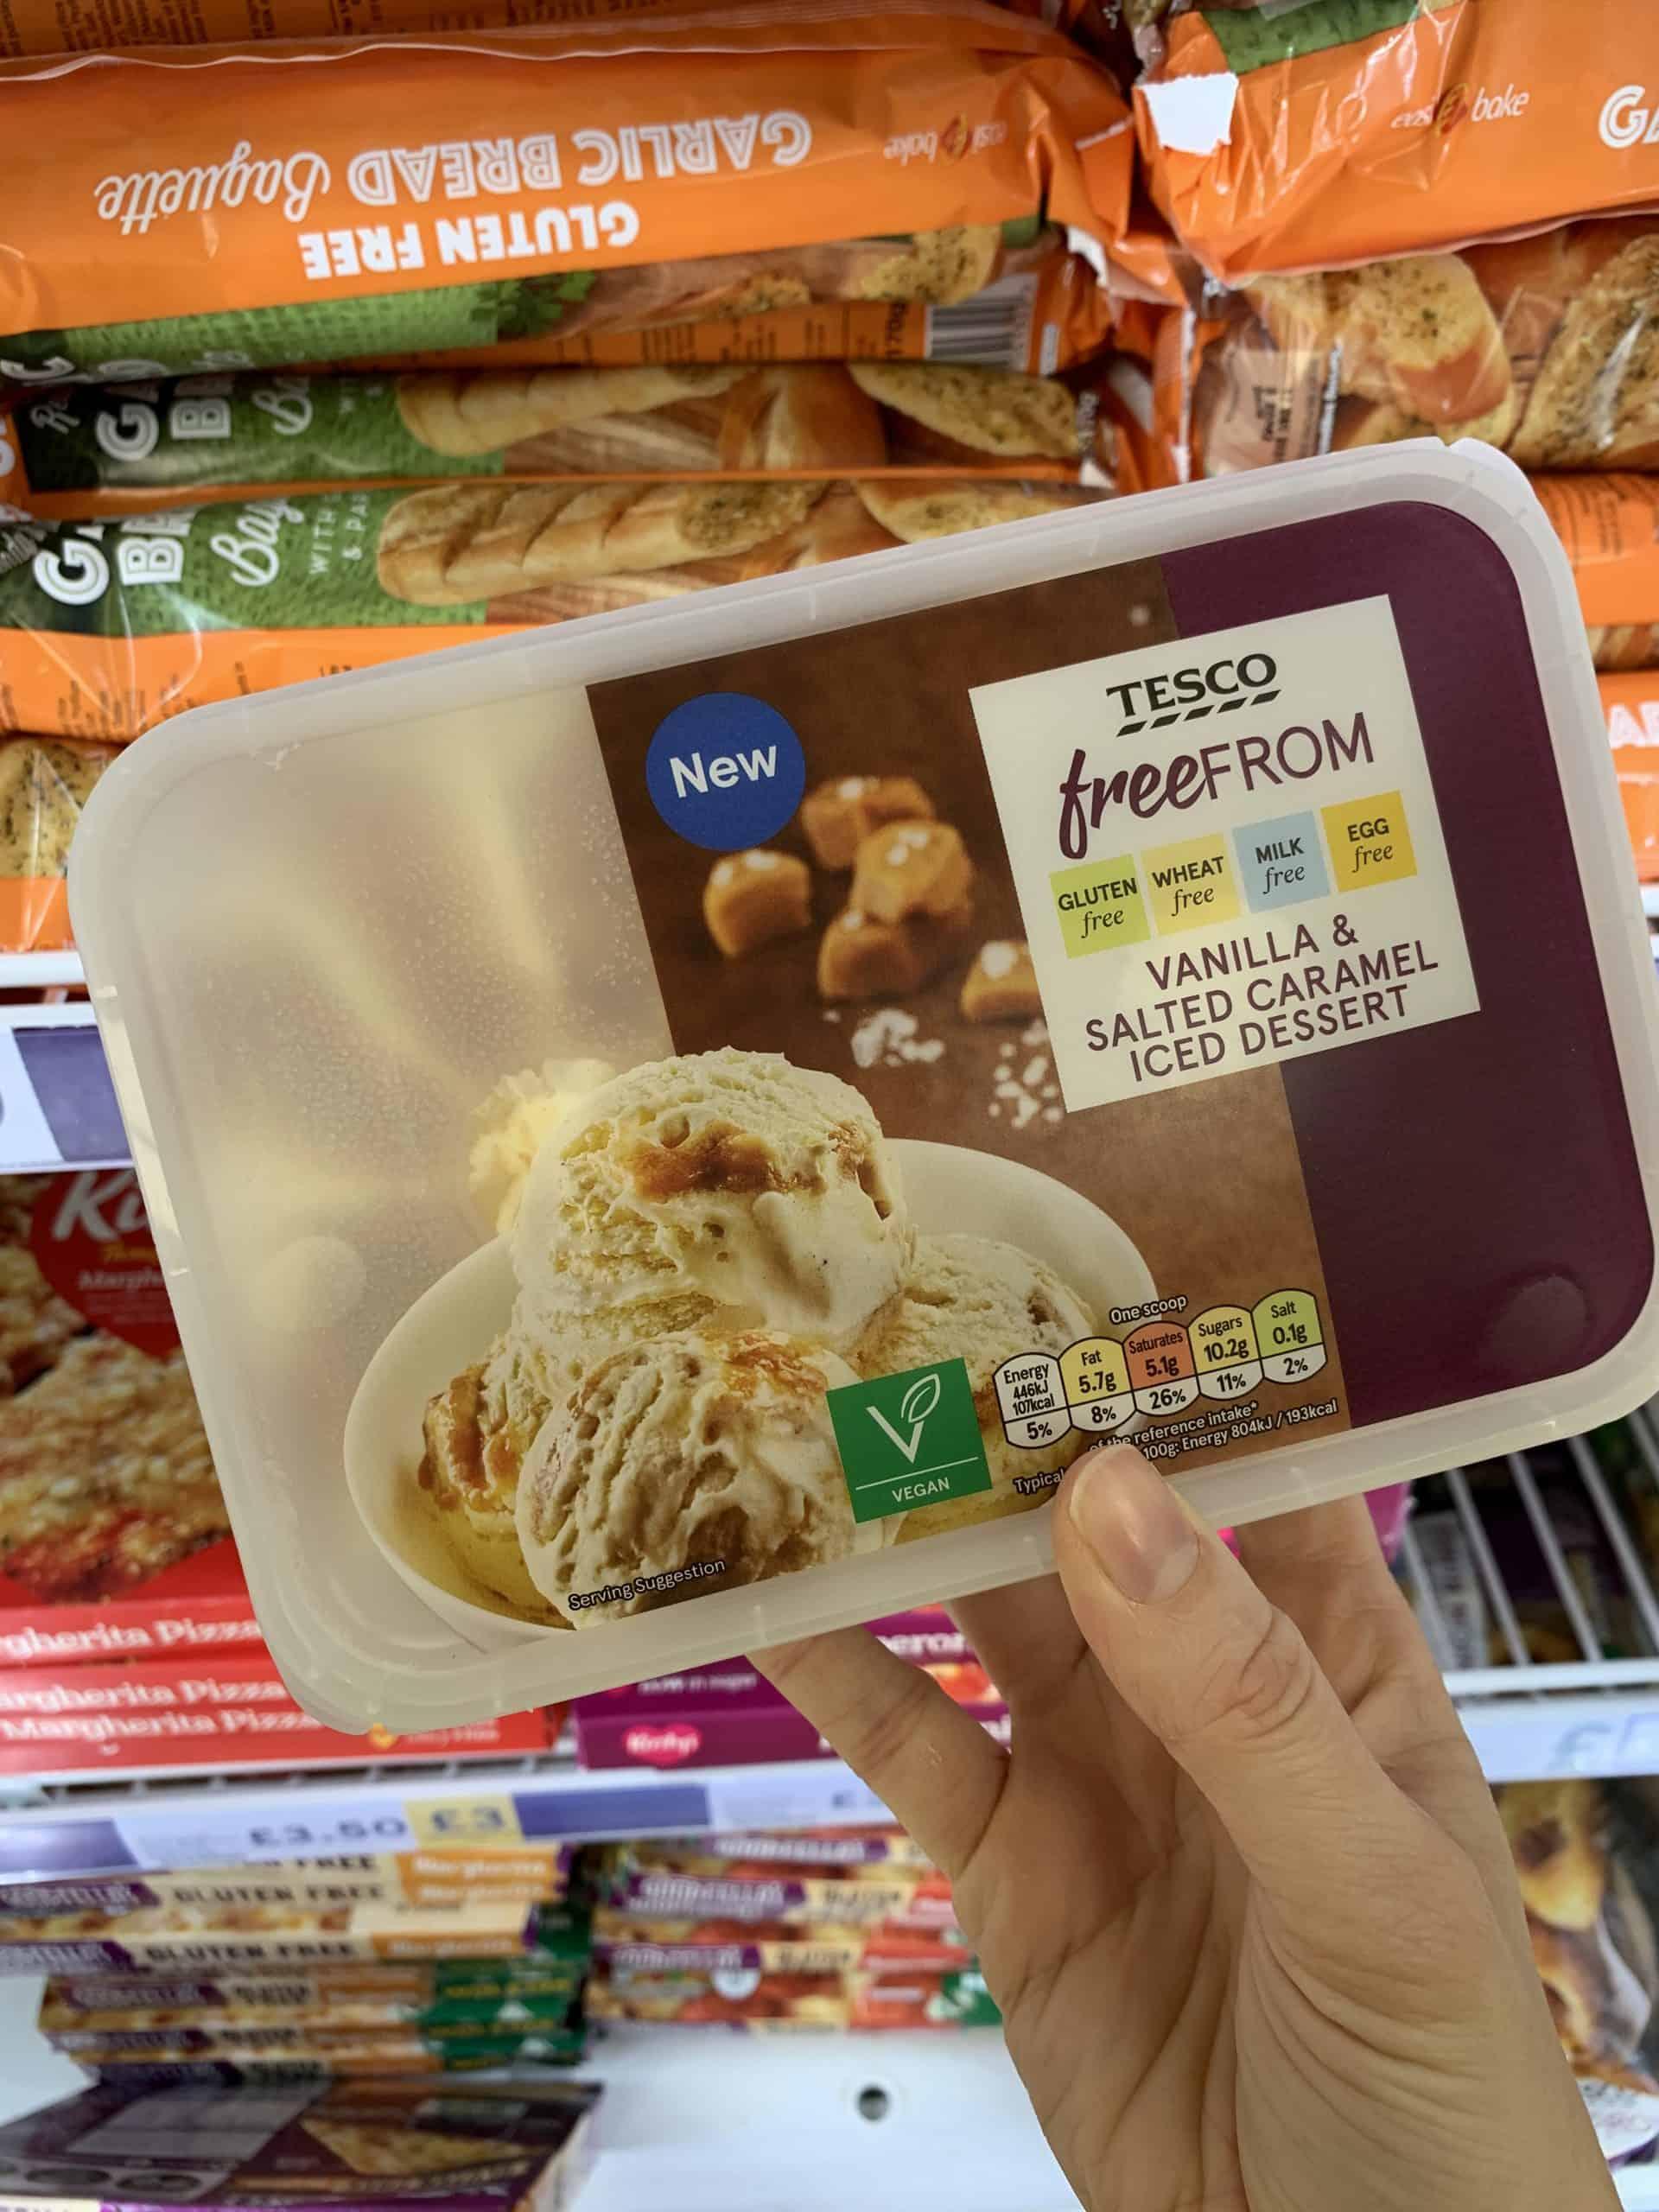 tesco gluten free ice-cream